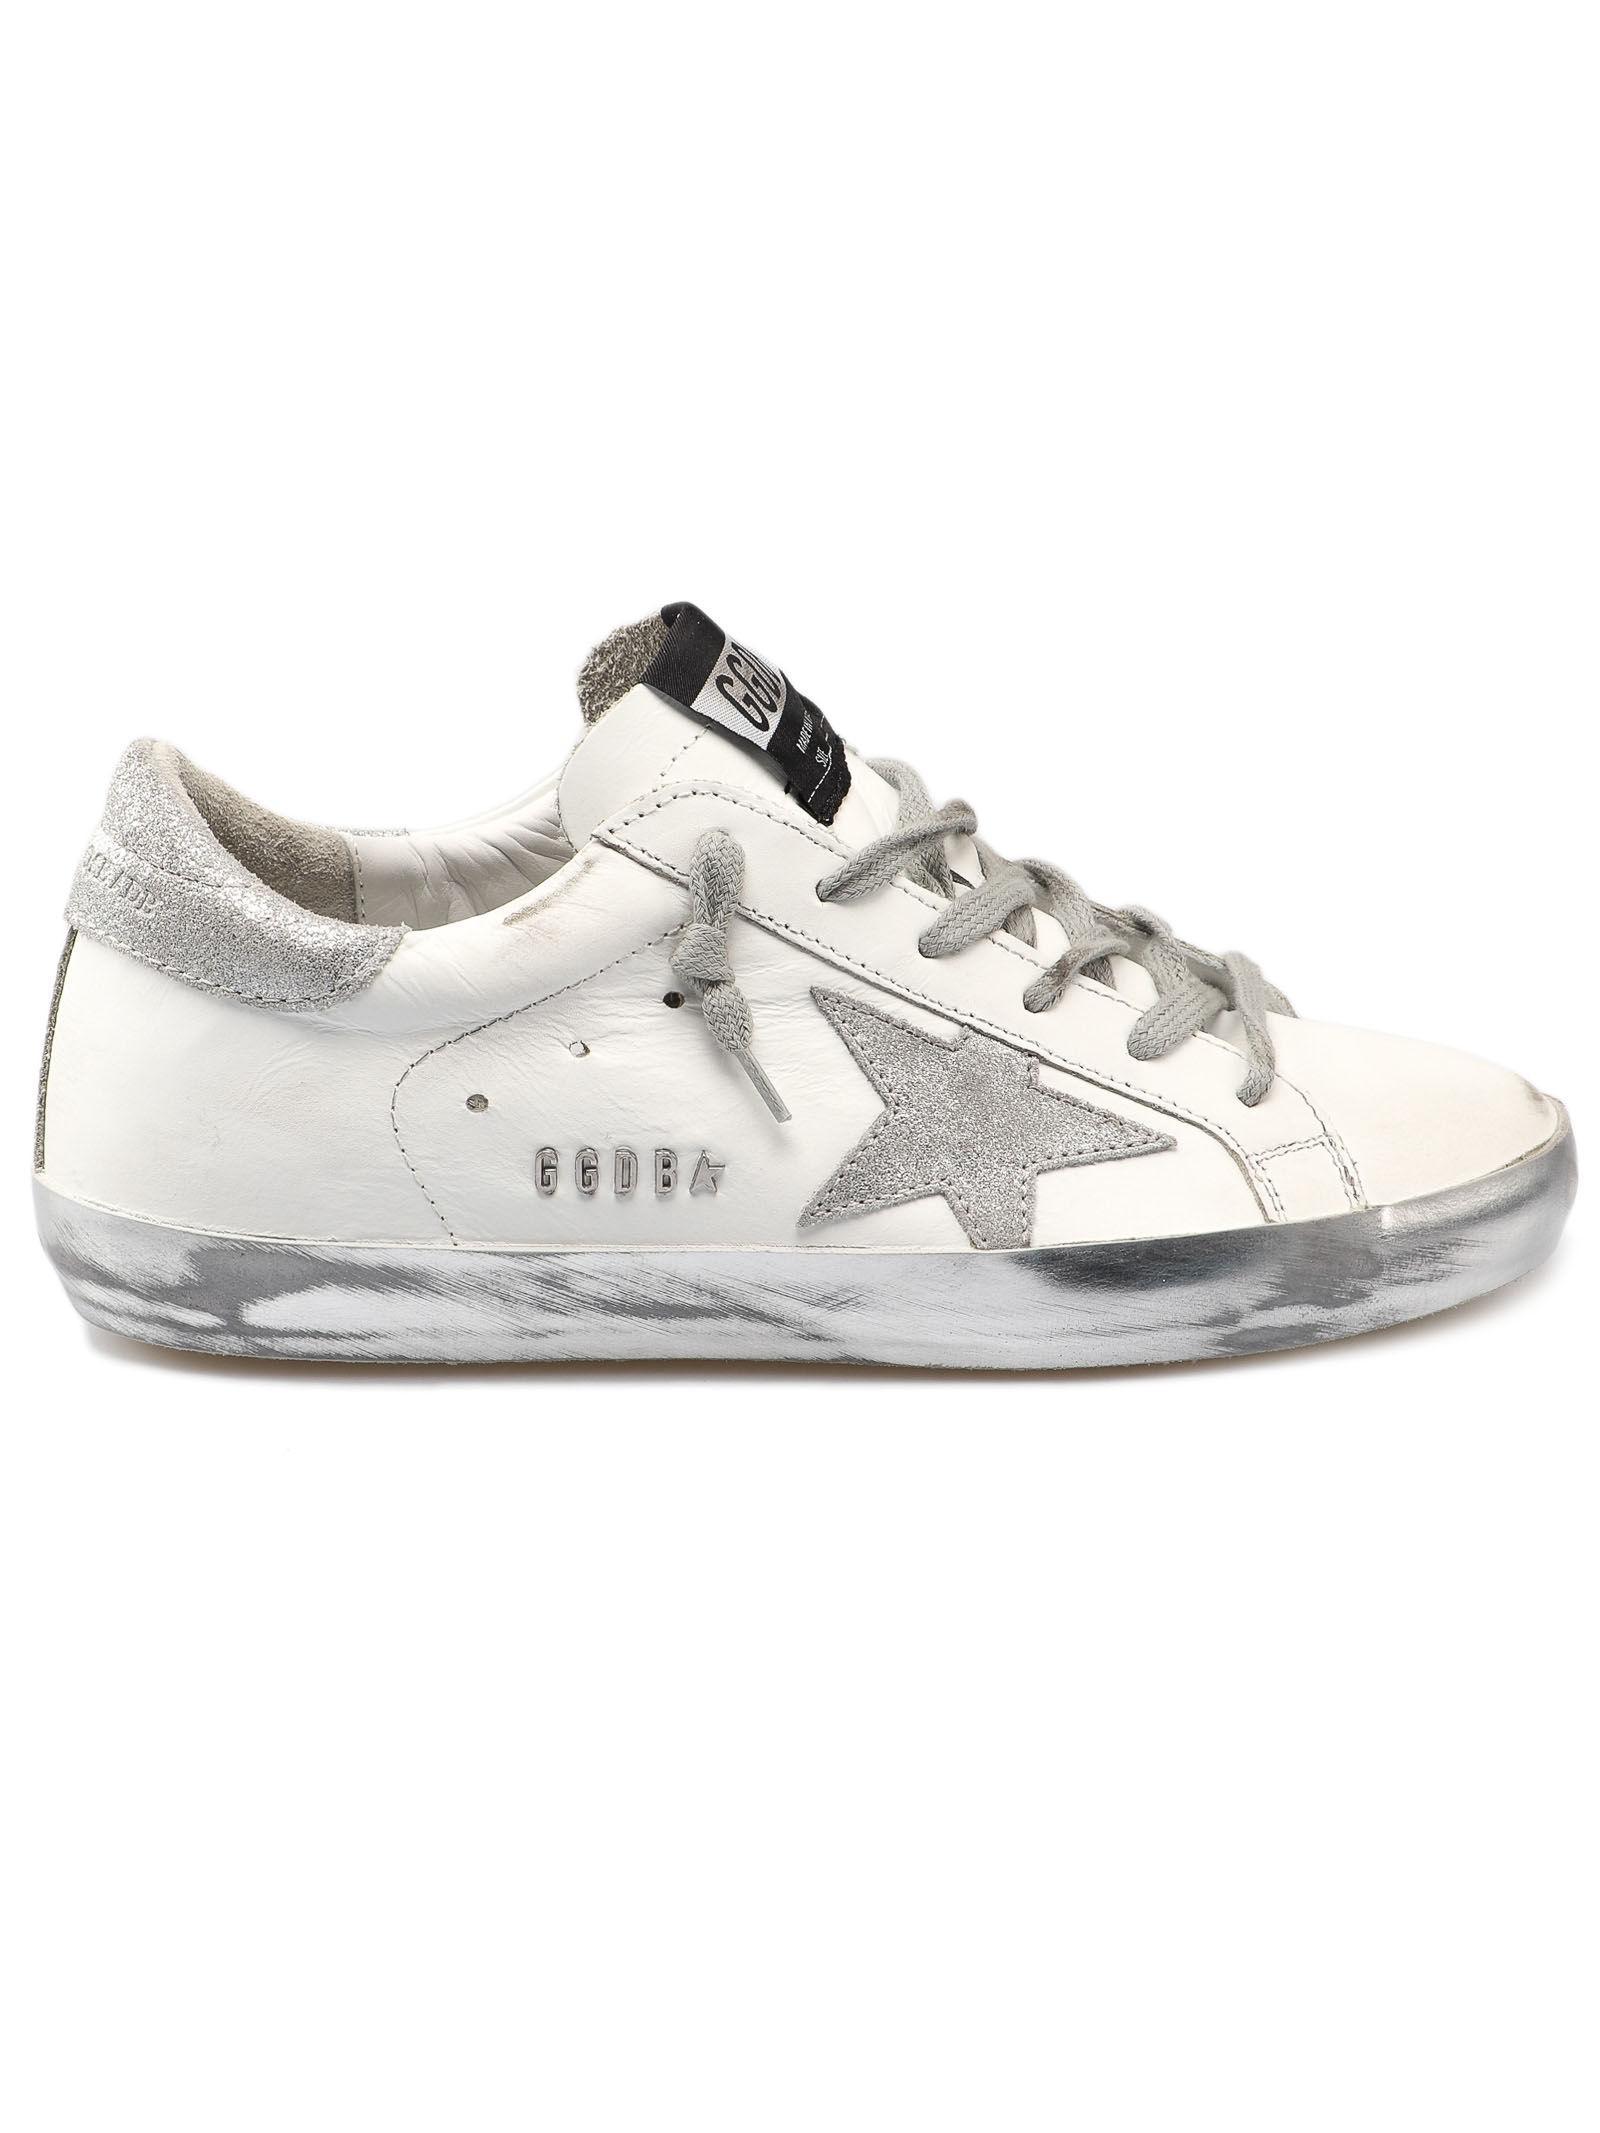 3788d8c06f60 Lyst - Golden Goose Deluxe Brand Sneakers Superstar in White